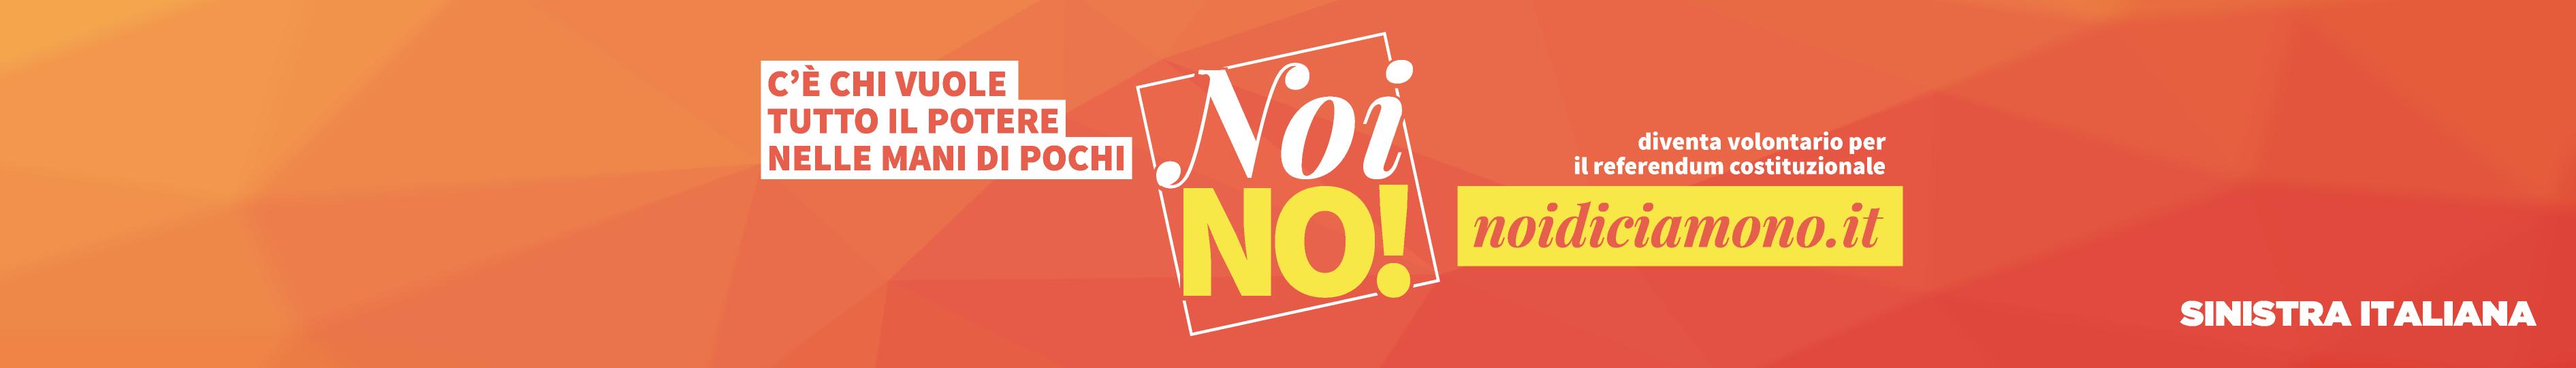 sinistra-italiana_io-voto-no_banner_s1